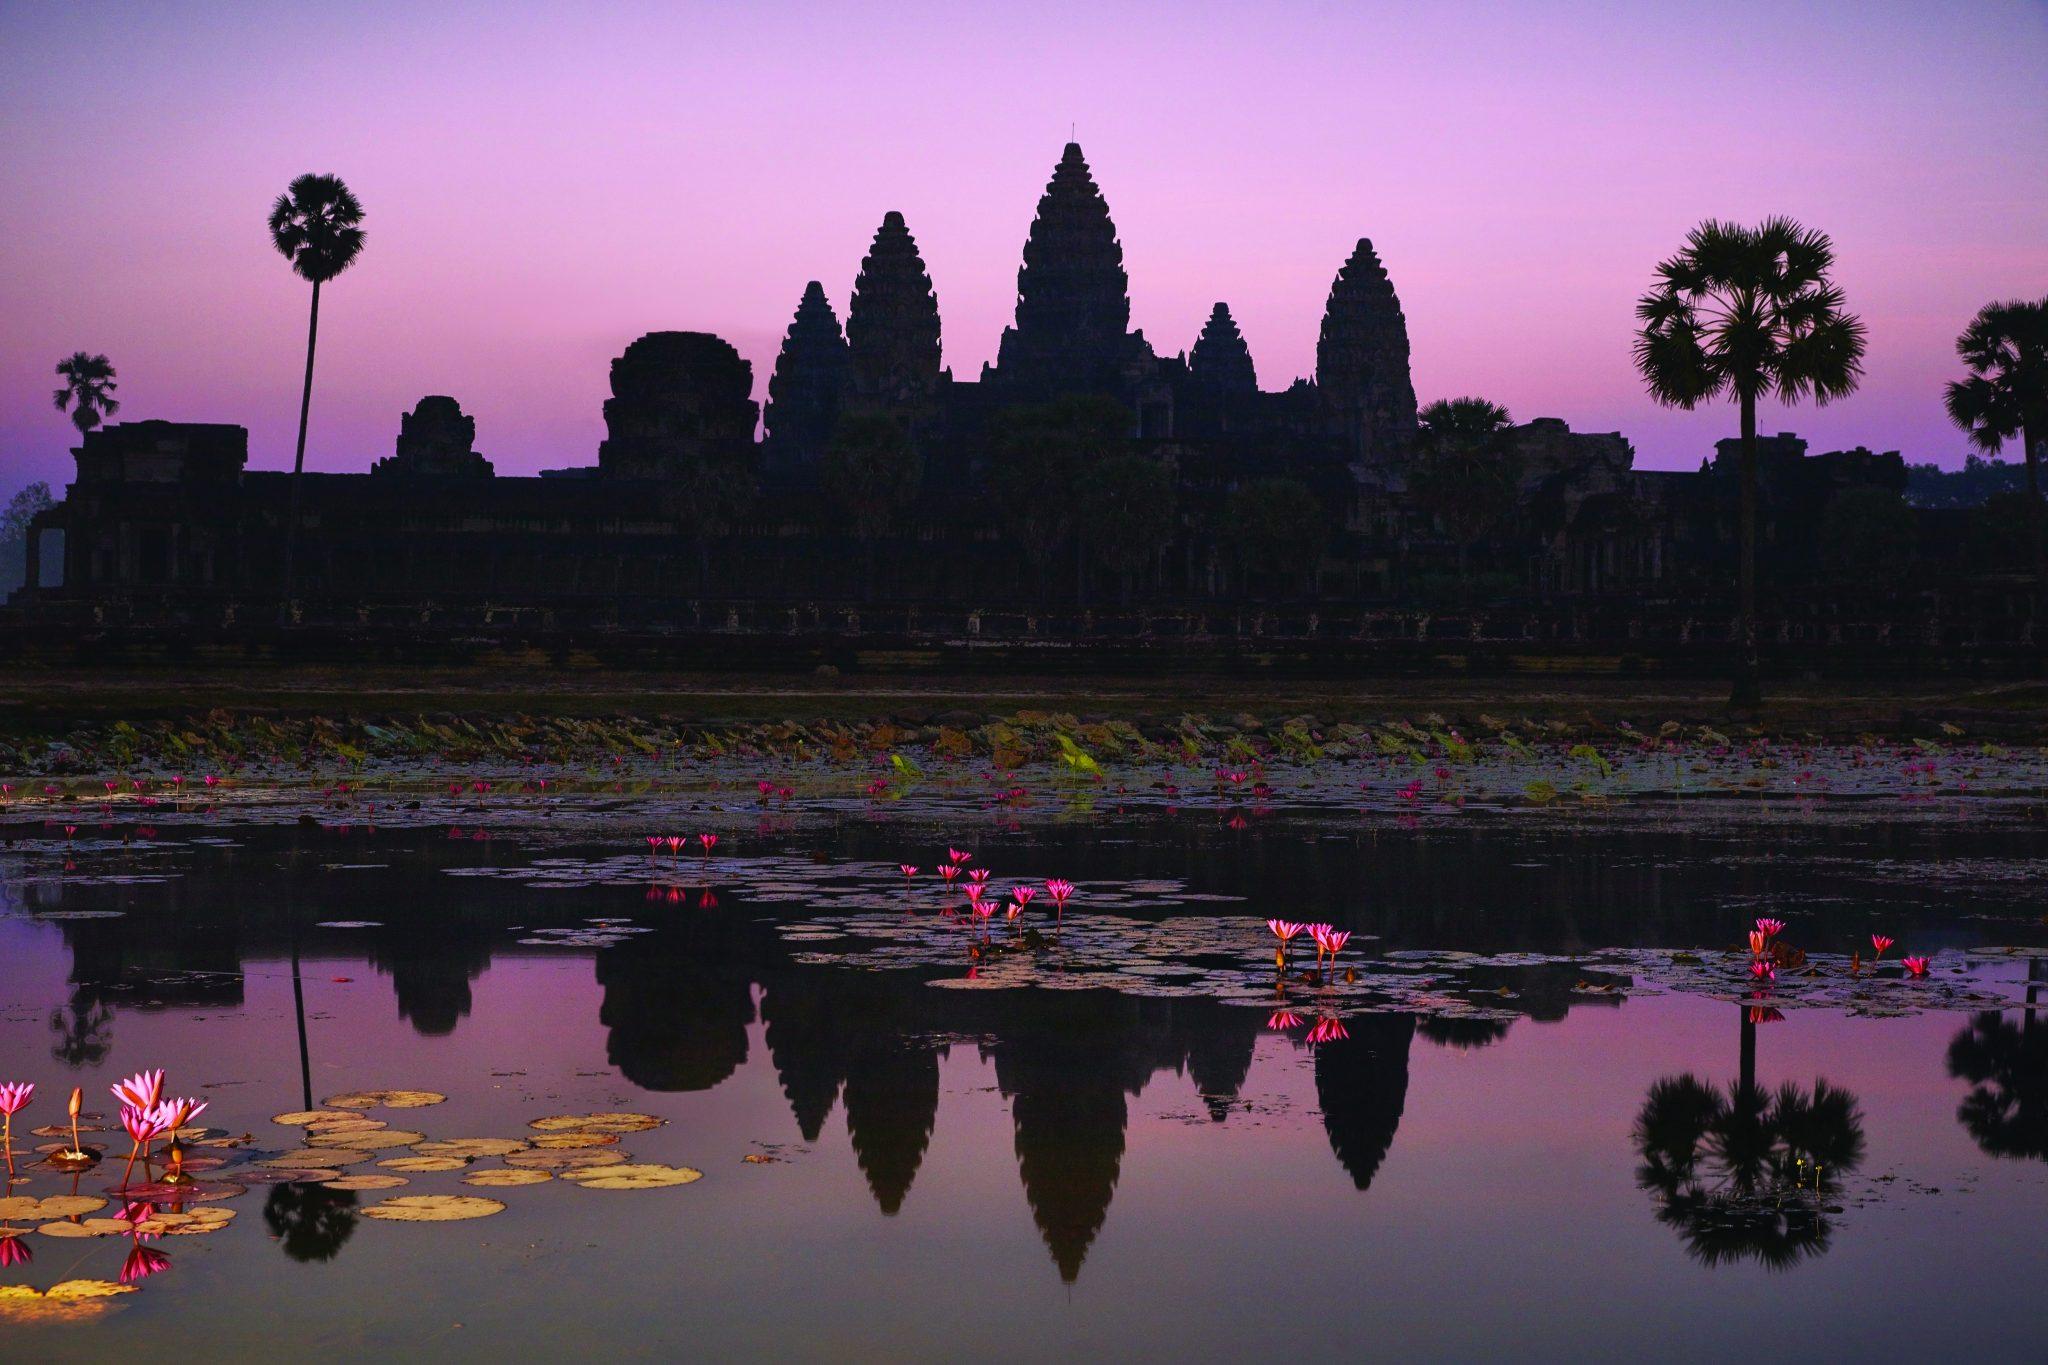 Belmond-La-Residence-Cambodia-Angkor-Wat-dawn